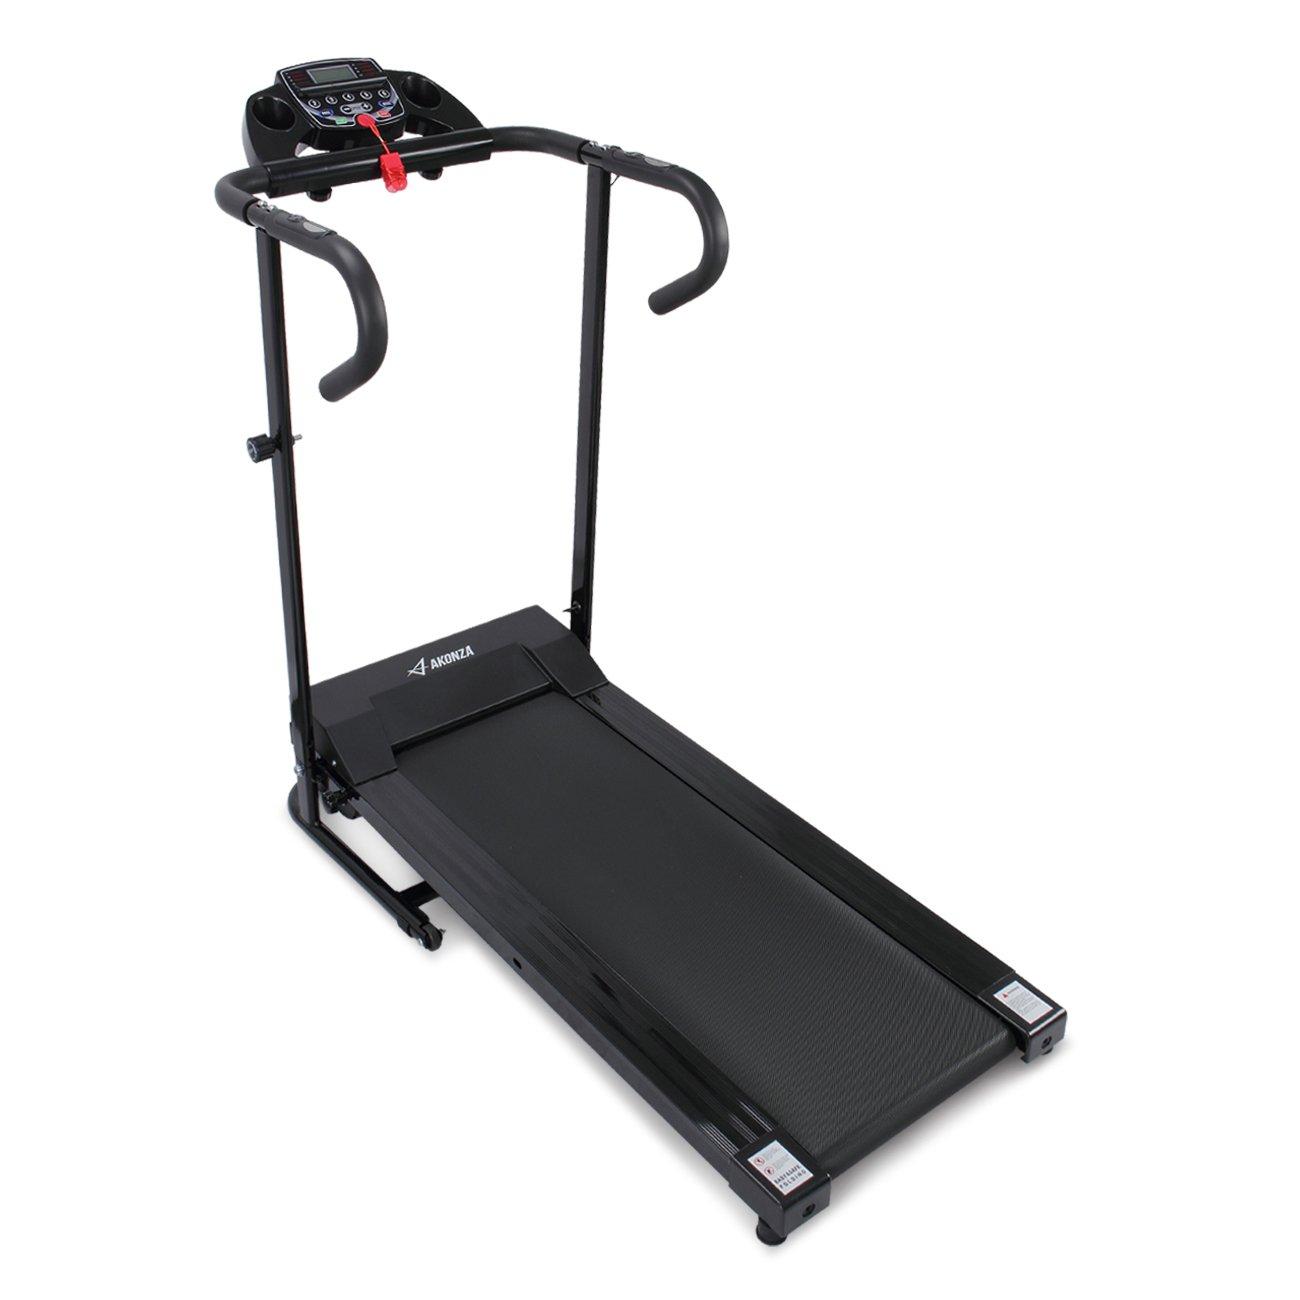 Akonza 1100W Folding Electric Treadmill Fitness Power Motorized Jogging Walking Running Machine w/Cup Holder, Black